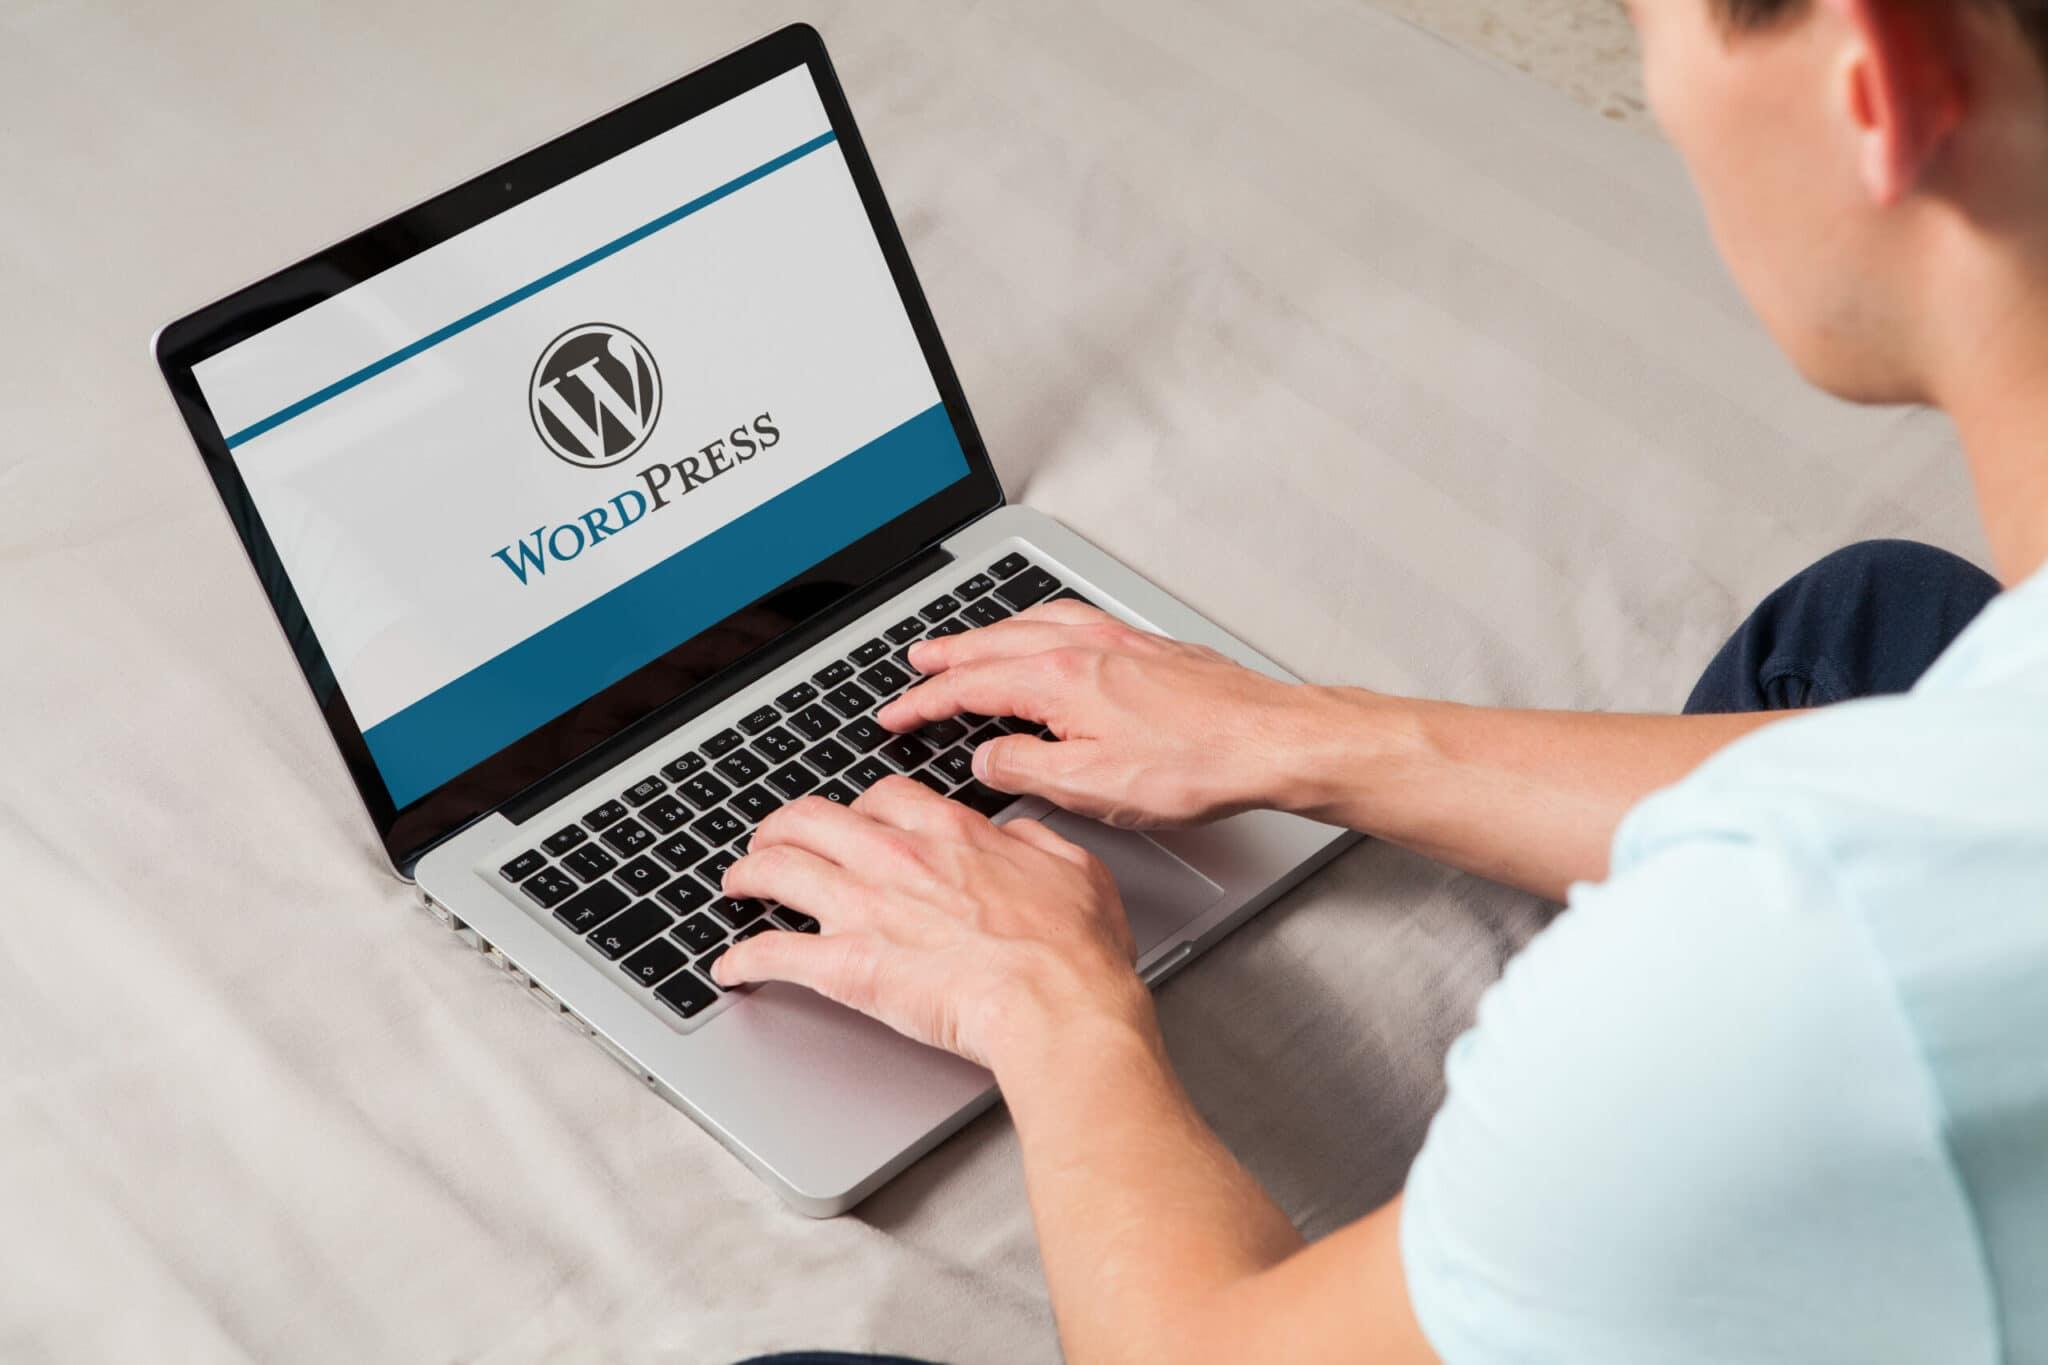 WordPress Dominates Market Share Of Top 10,000 Websites via @sejournal, @RebekahDunne